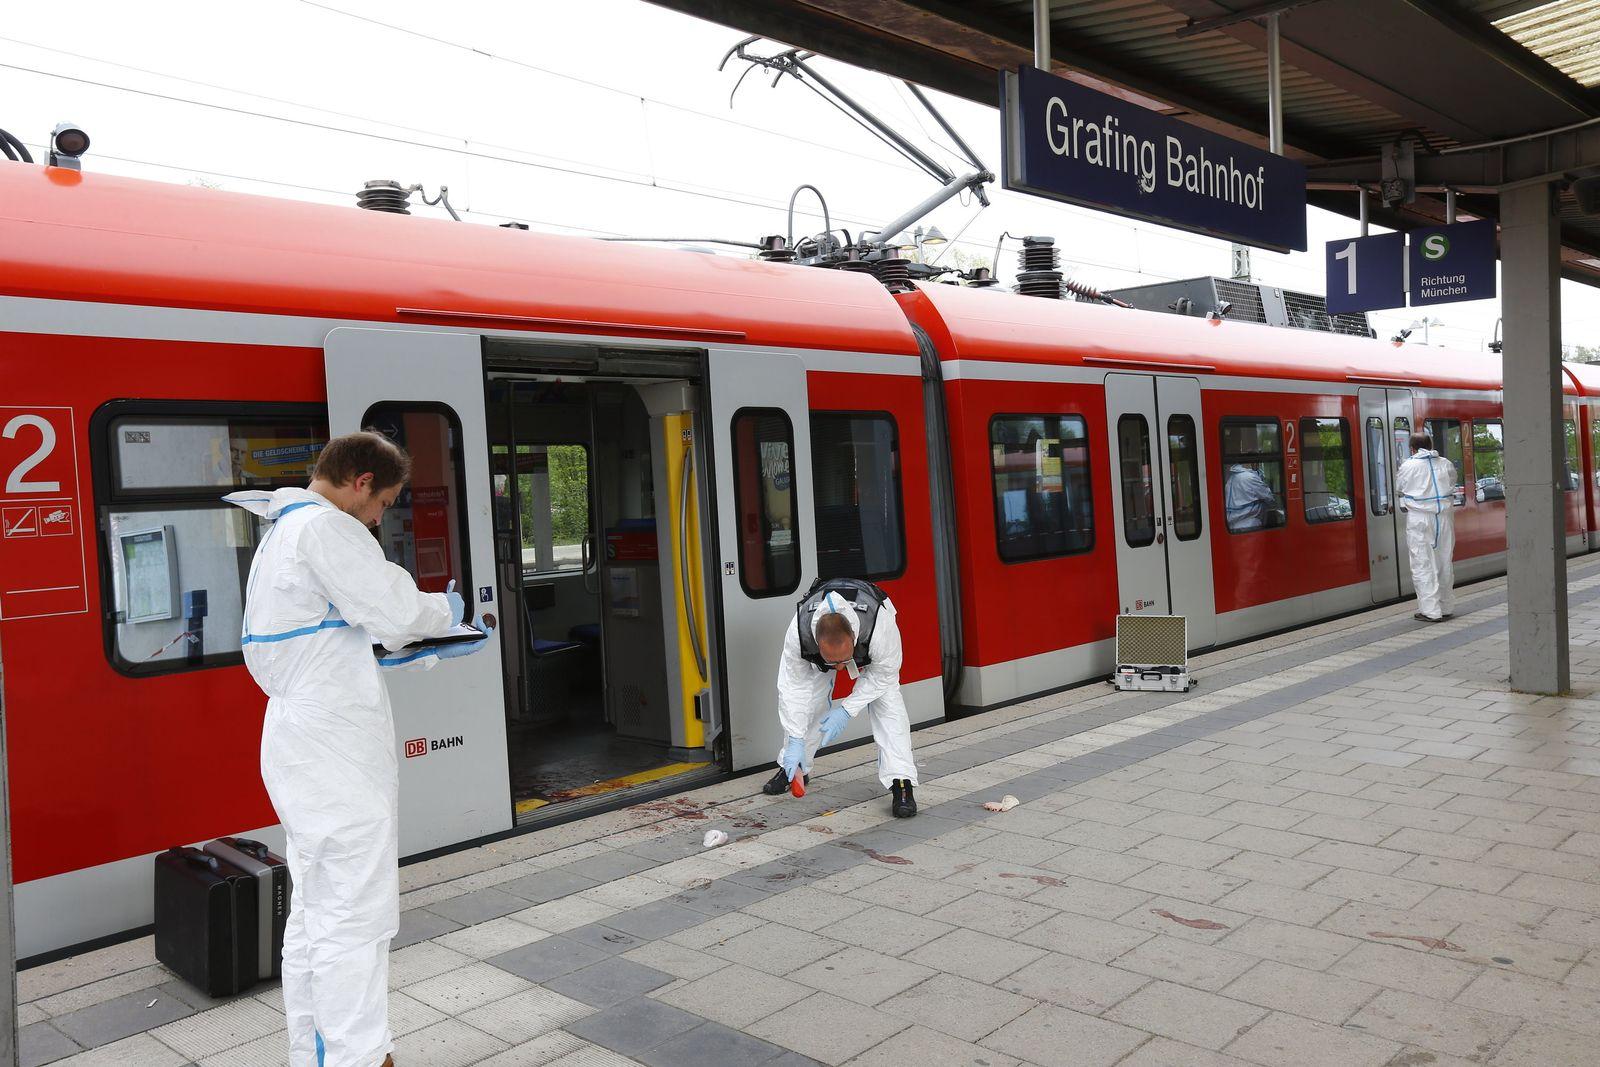 Grafing/ Messerattacke am Bahnhof